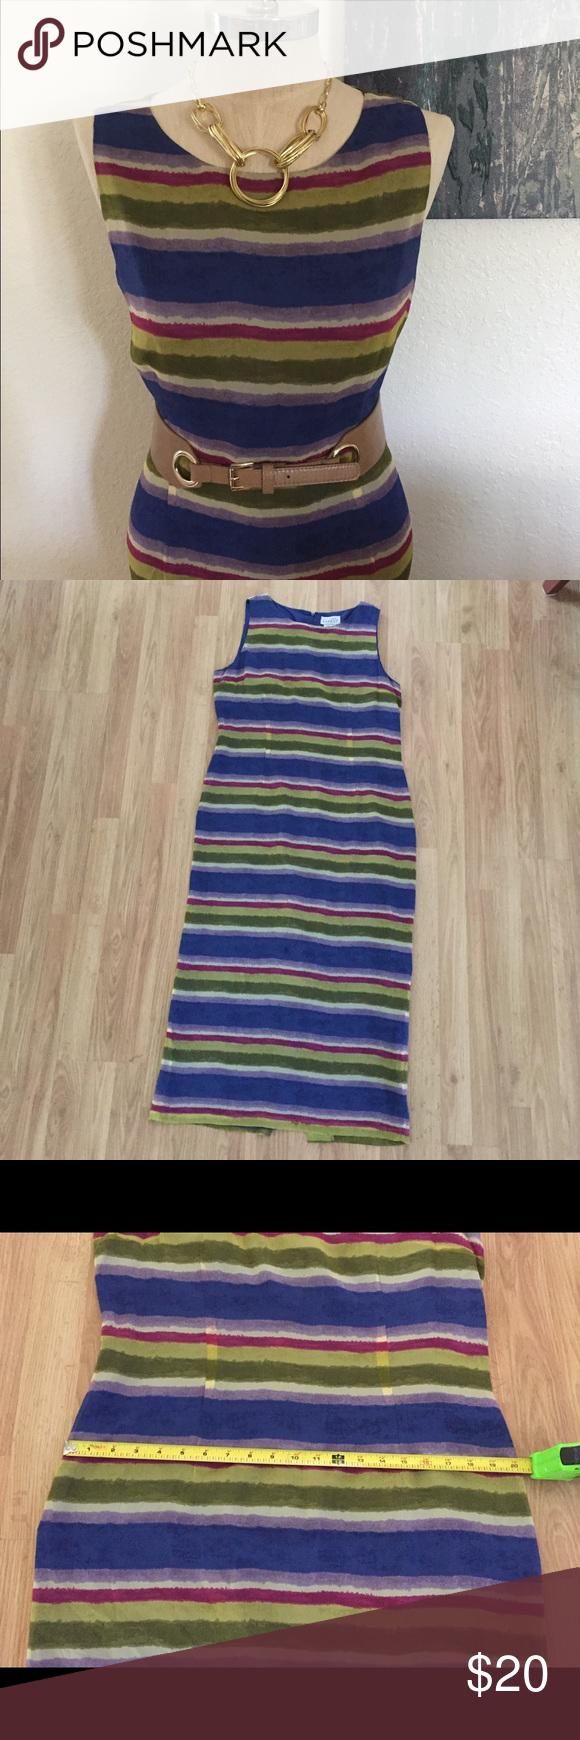 Lyst - Adrianna Papell Sheer-Stripe Flared Dress in Metallic